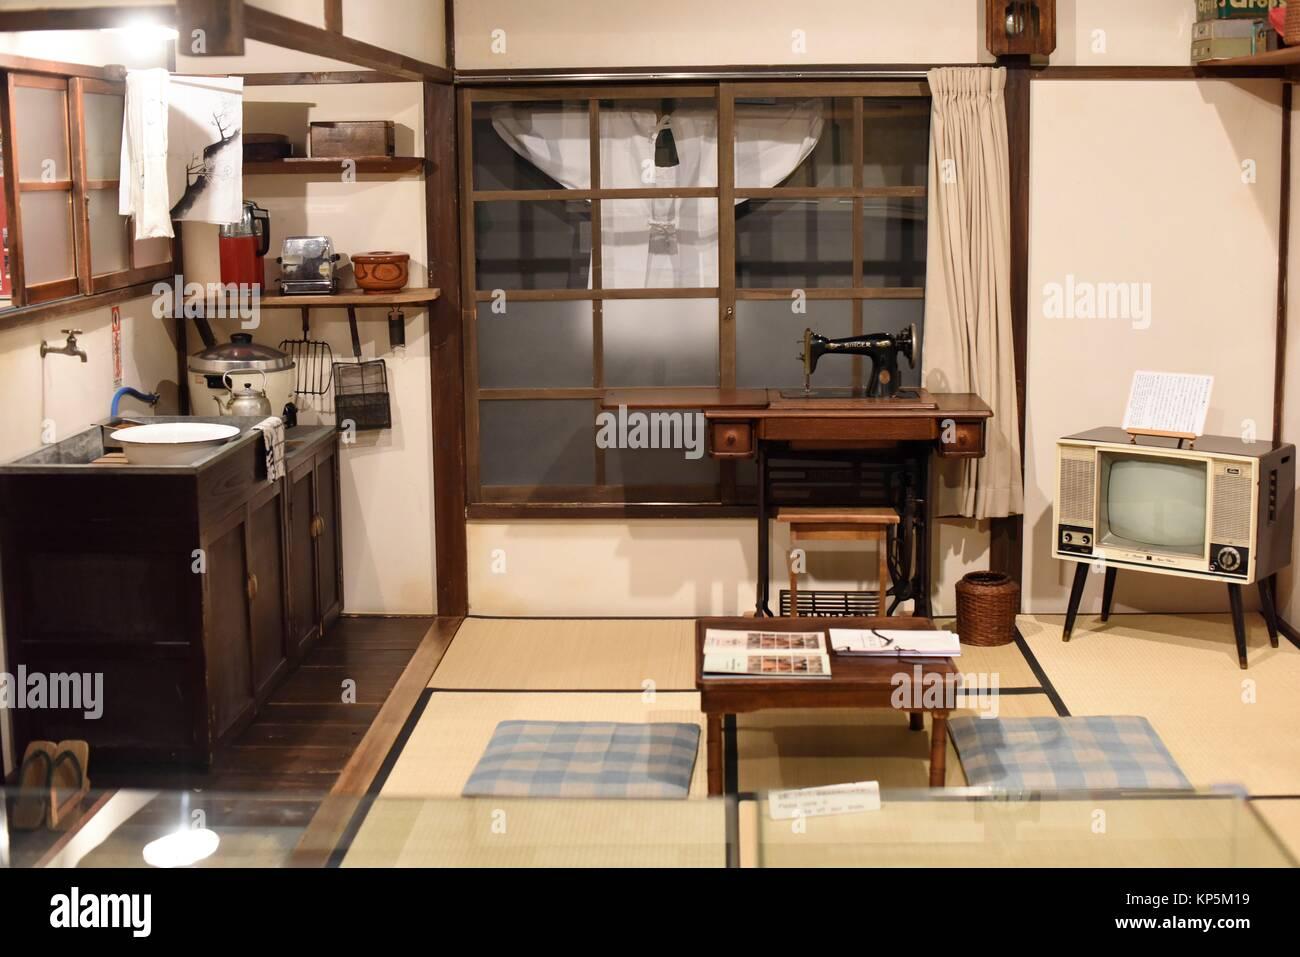 Maison ancienne, Shitamachi museum, Tokyo, Japon, Asie. Photo Stock